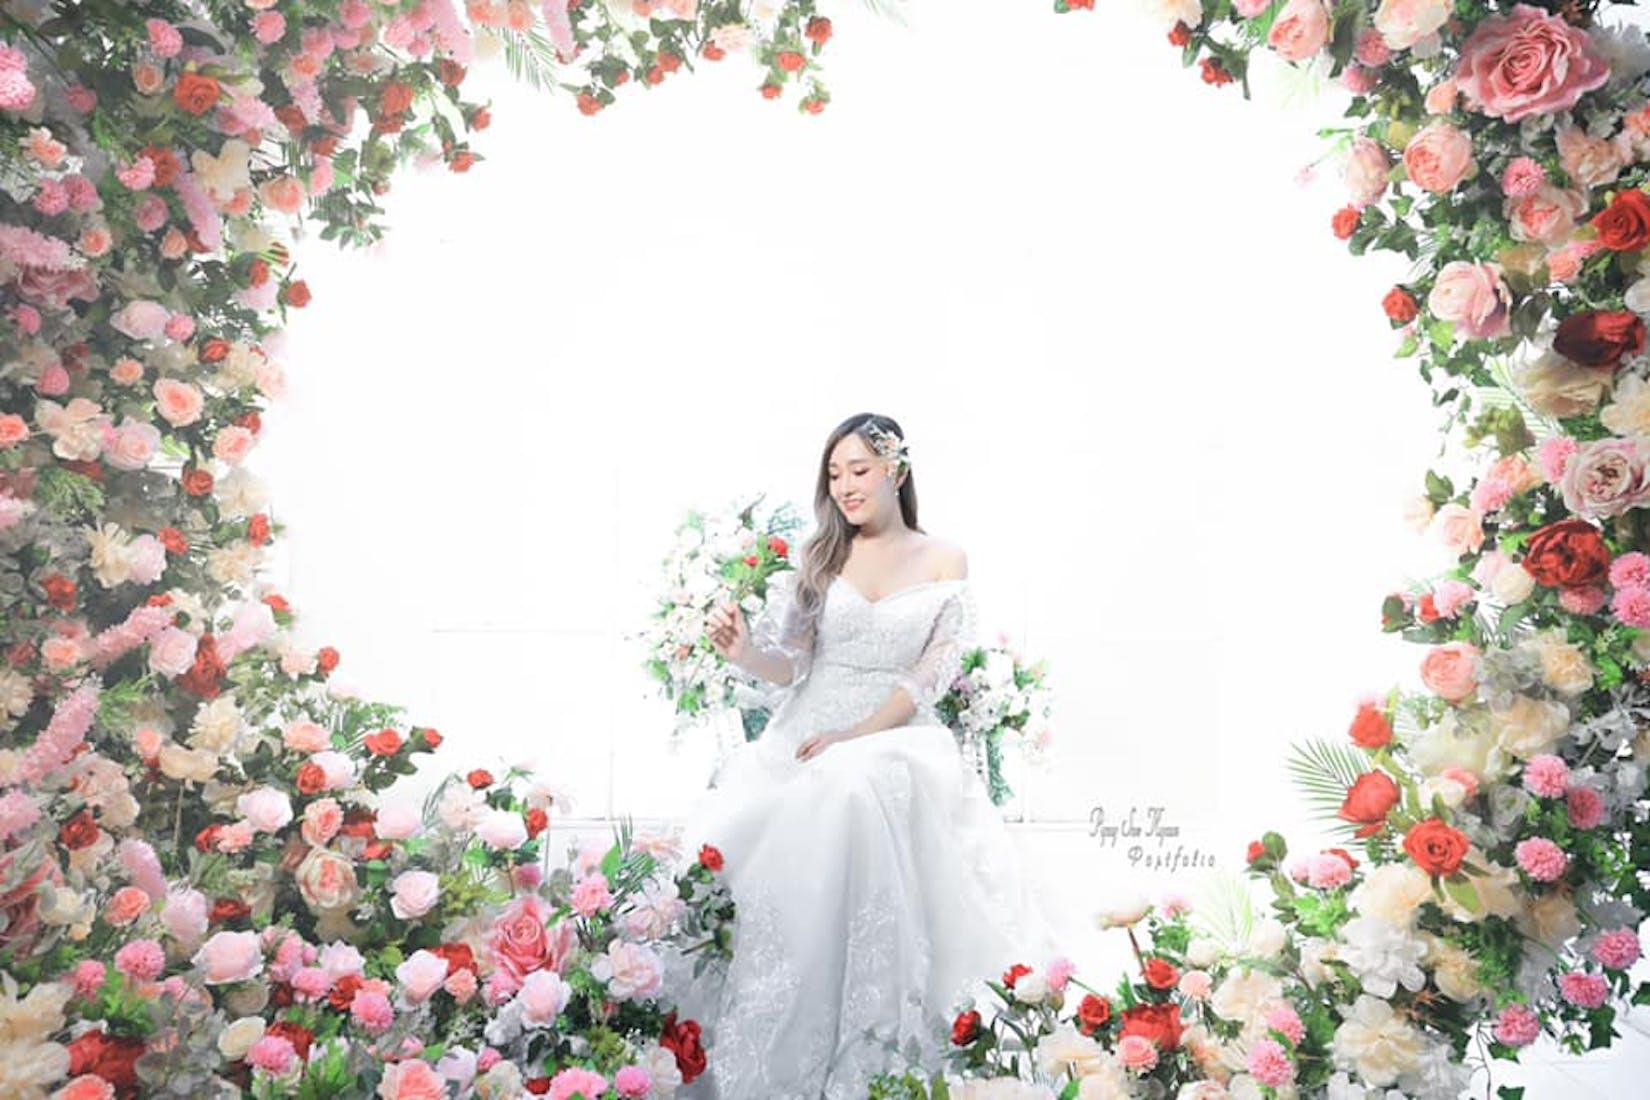 Vivian Beauty & Makeup Studio | Beauty